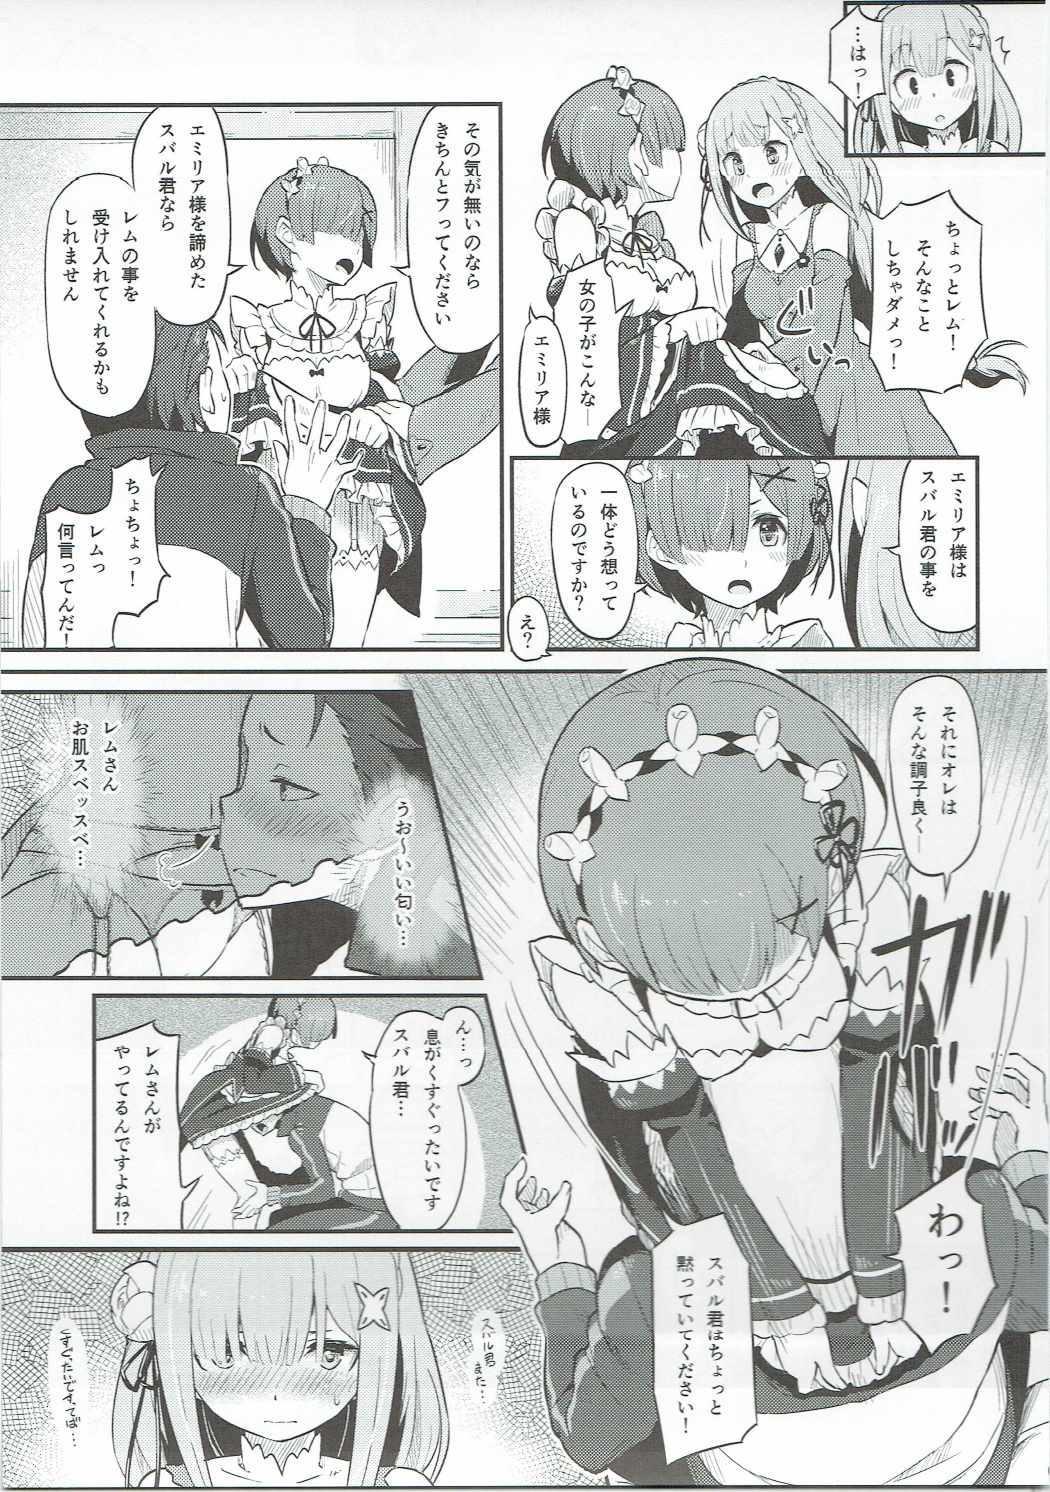 Rem no Emilia Kuttsuke Daisakusen 5